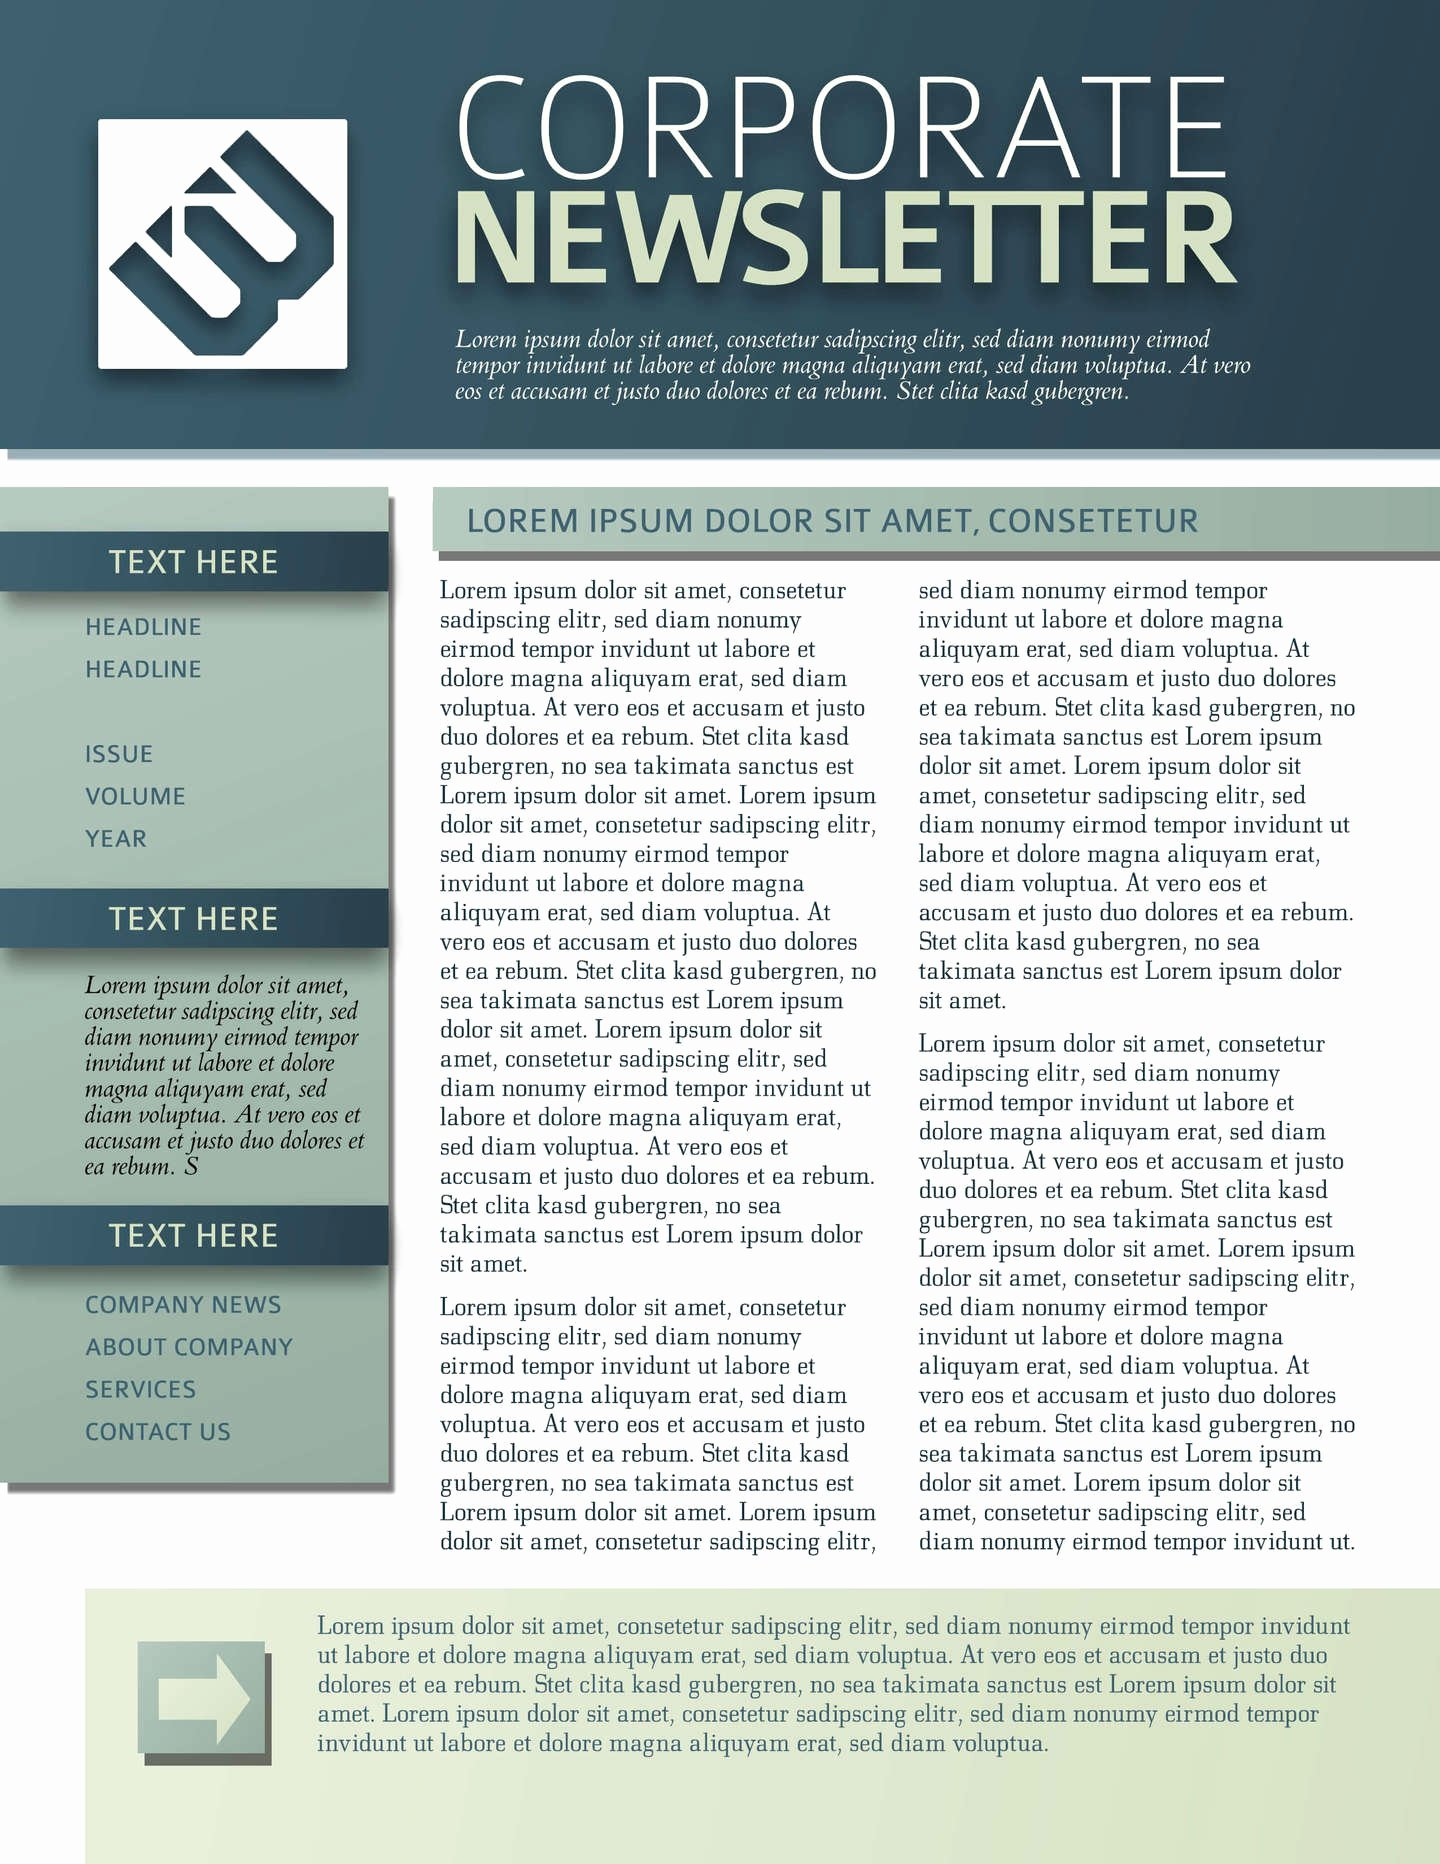 Newsletter Templates In Word Portablegasgrillweber